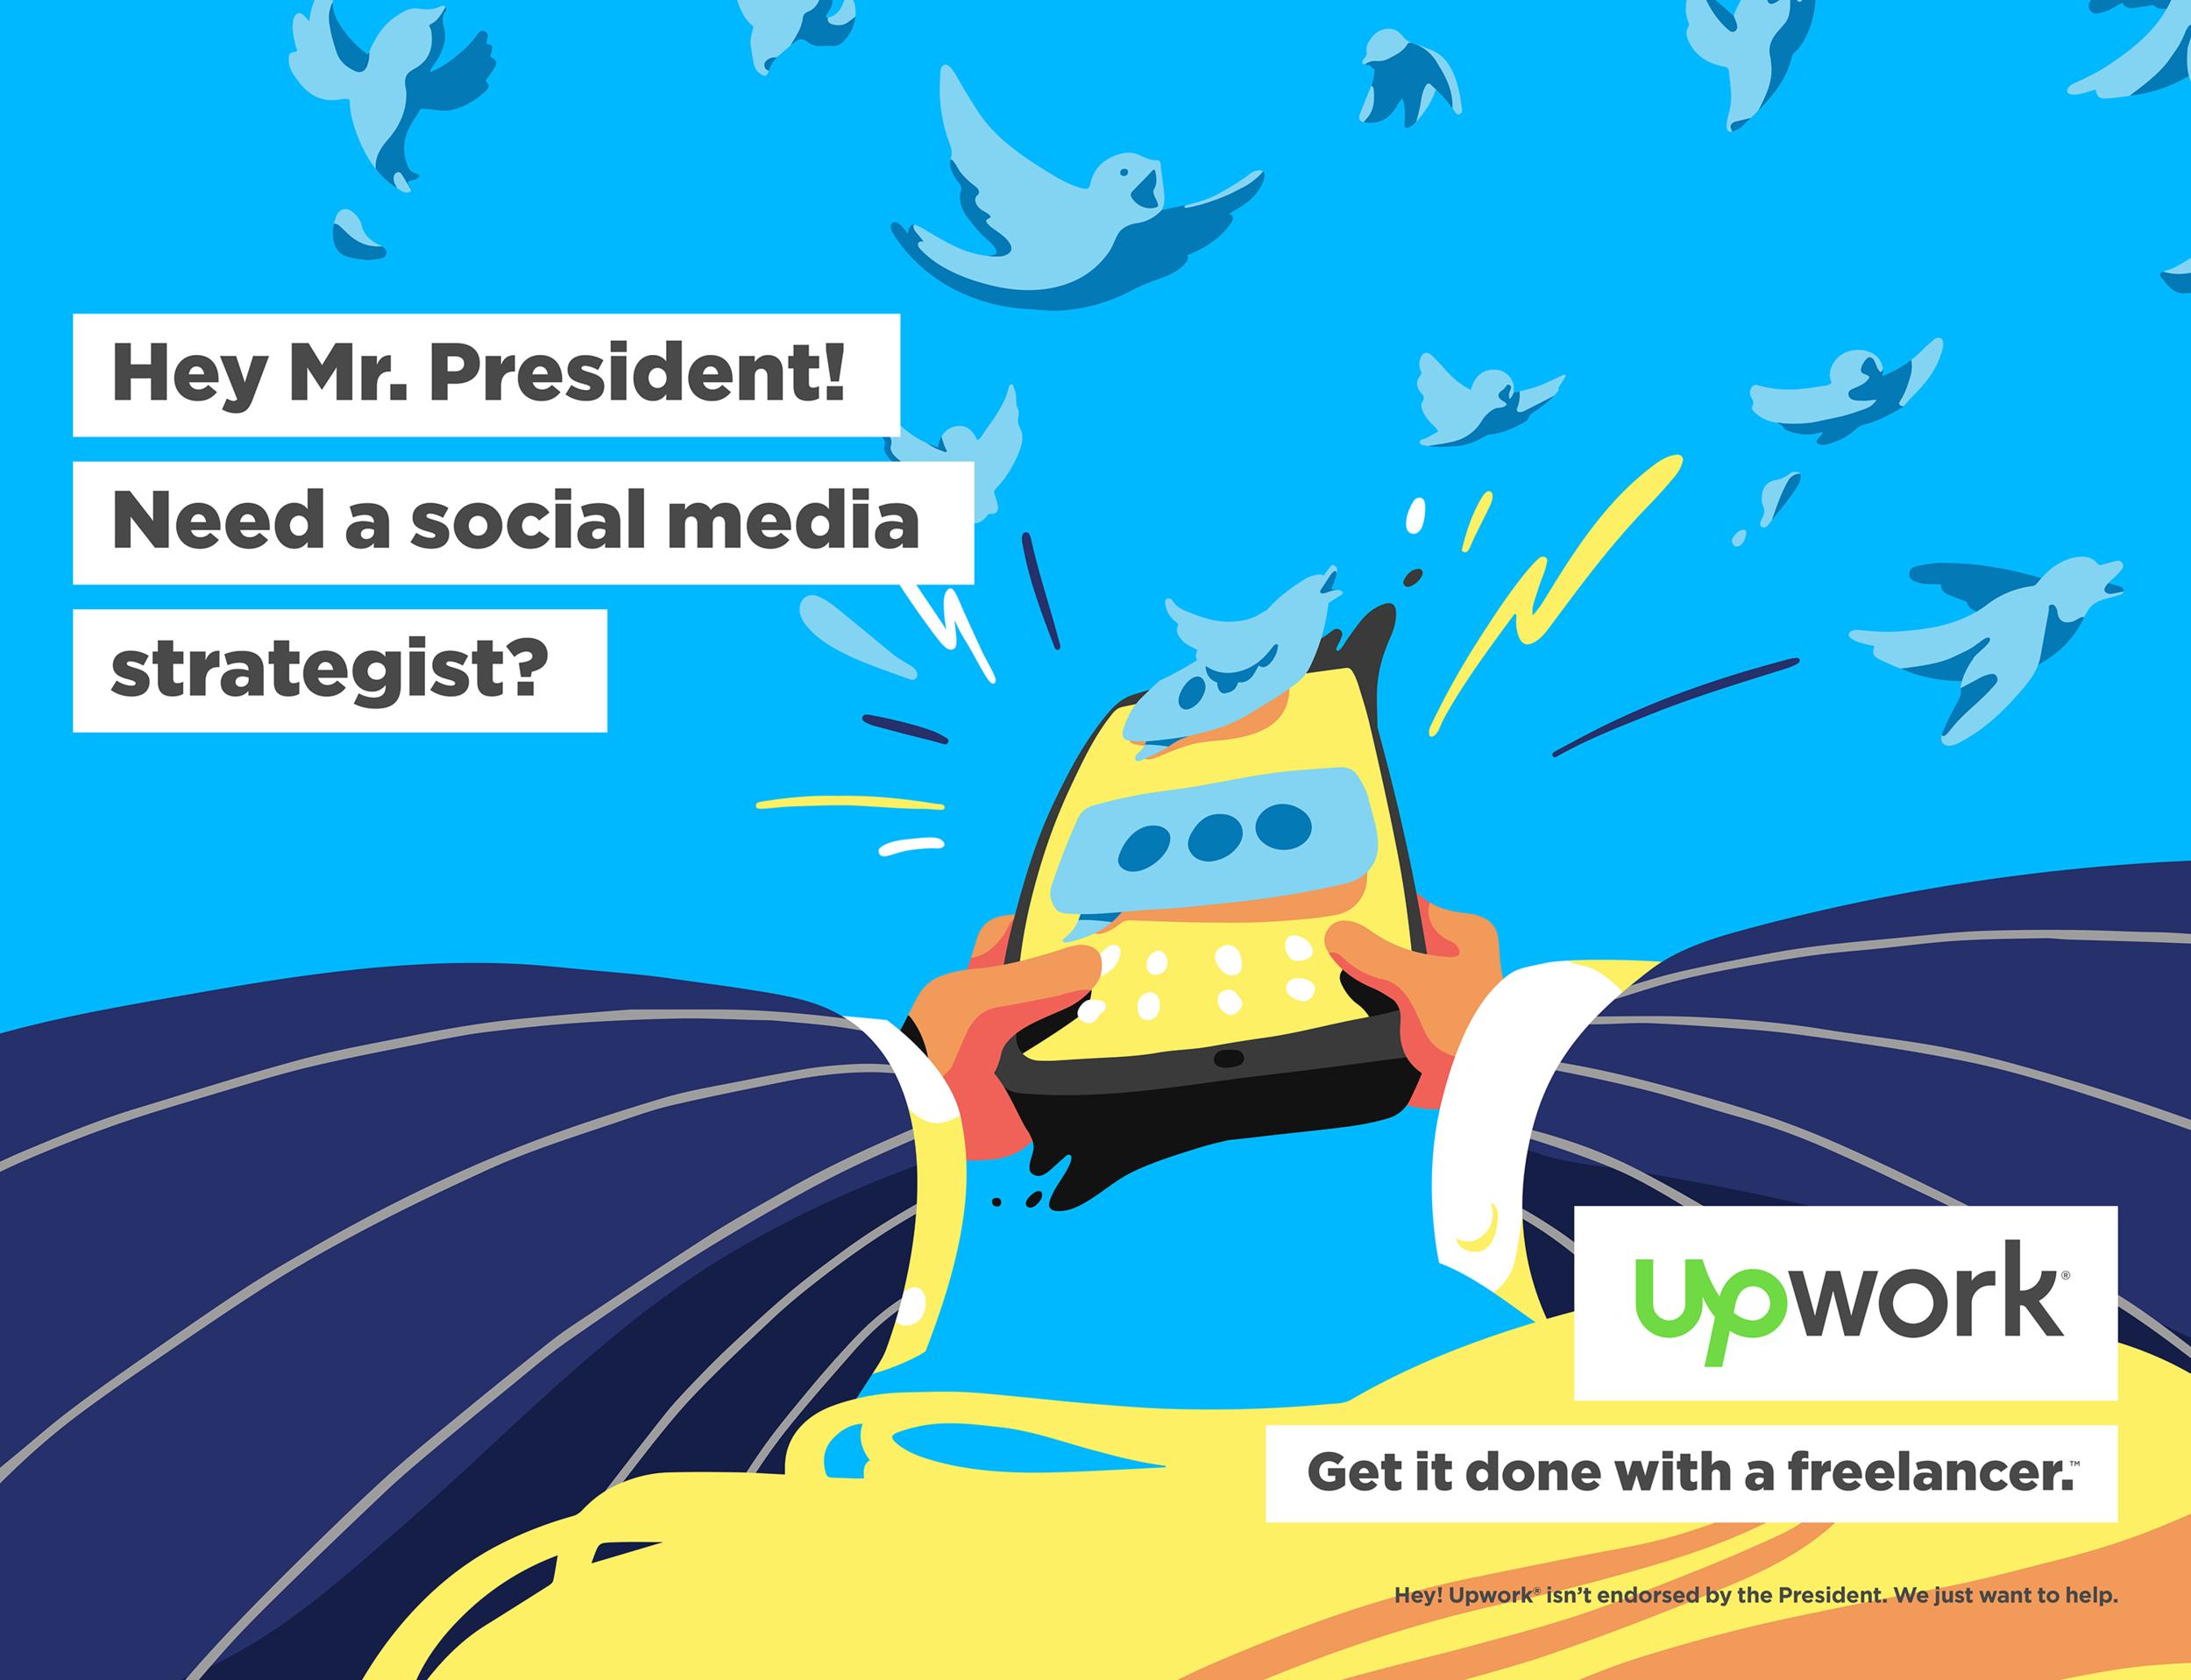 Upwork-OOH-01-Hey-Mr-President.png